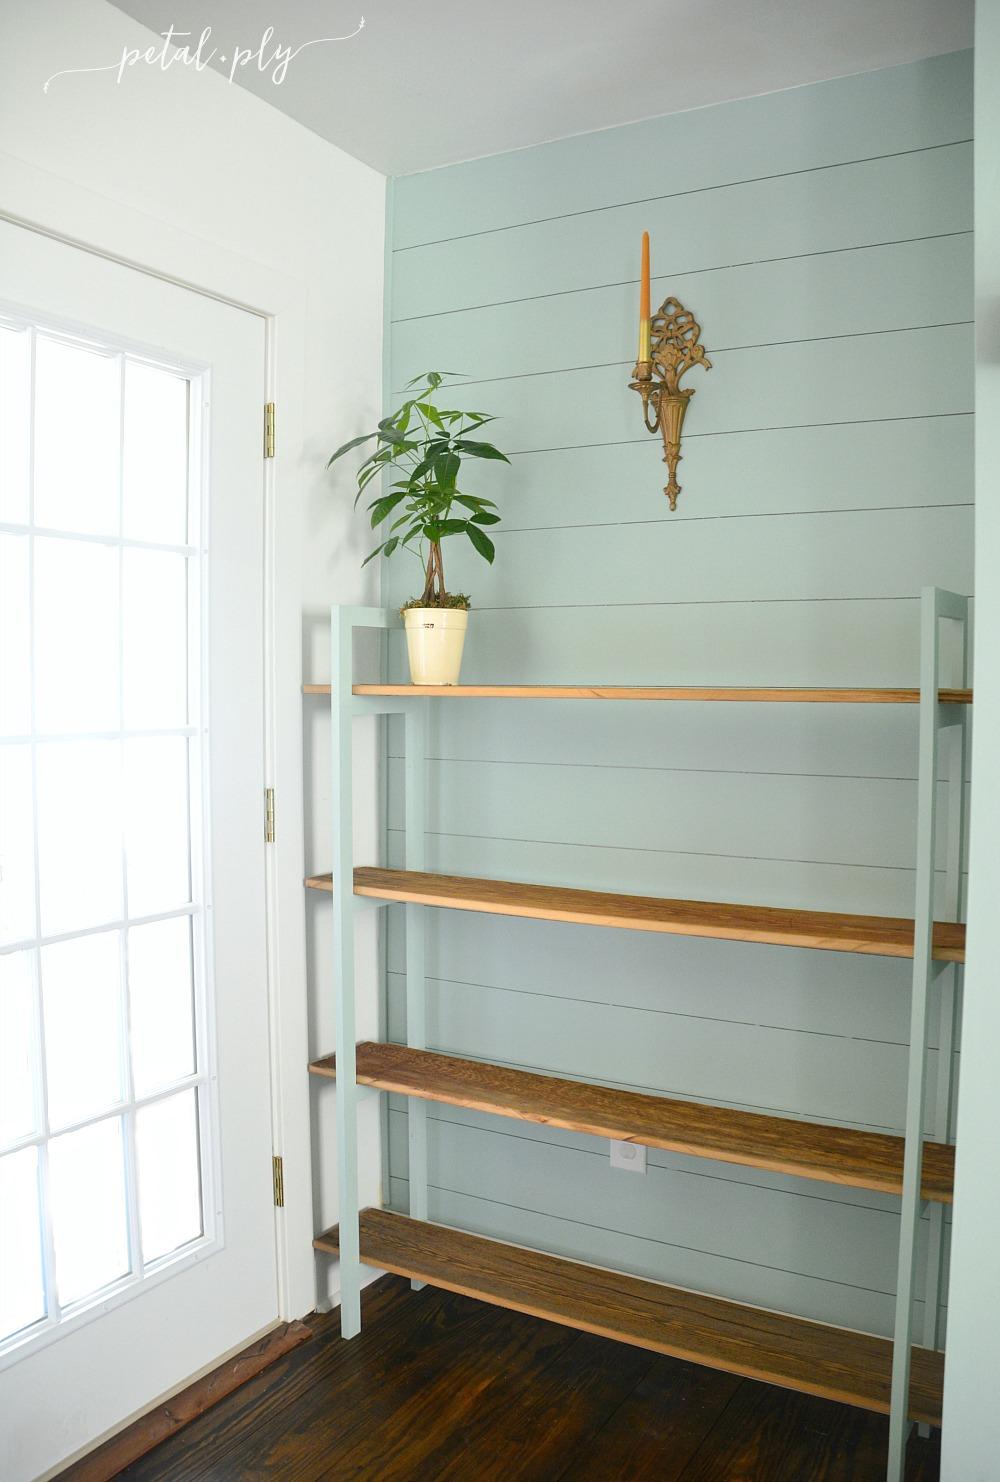 customized-barnwood-shelf-green-blue-shiplap-plank-wall